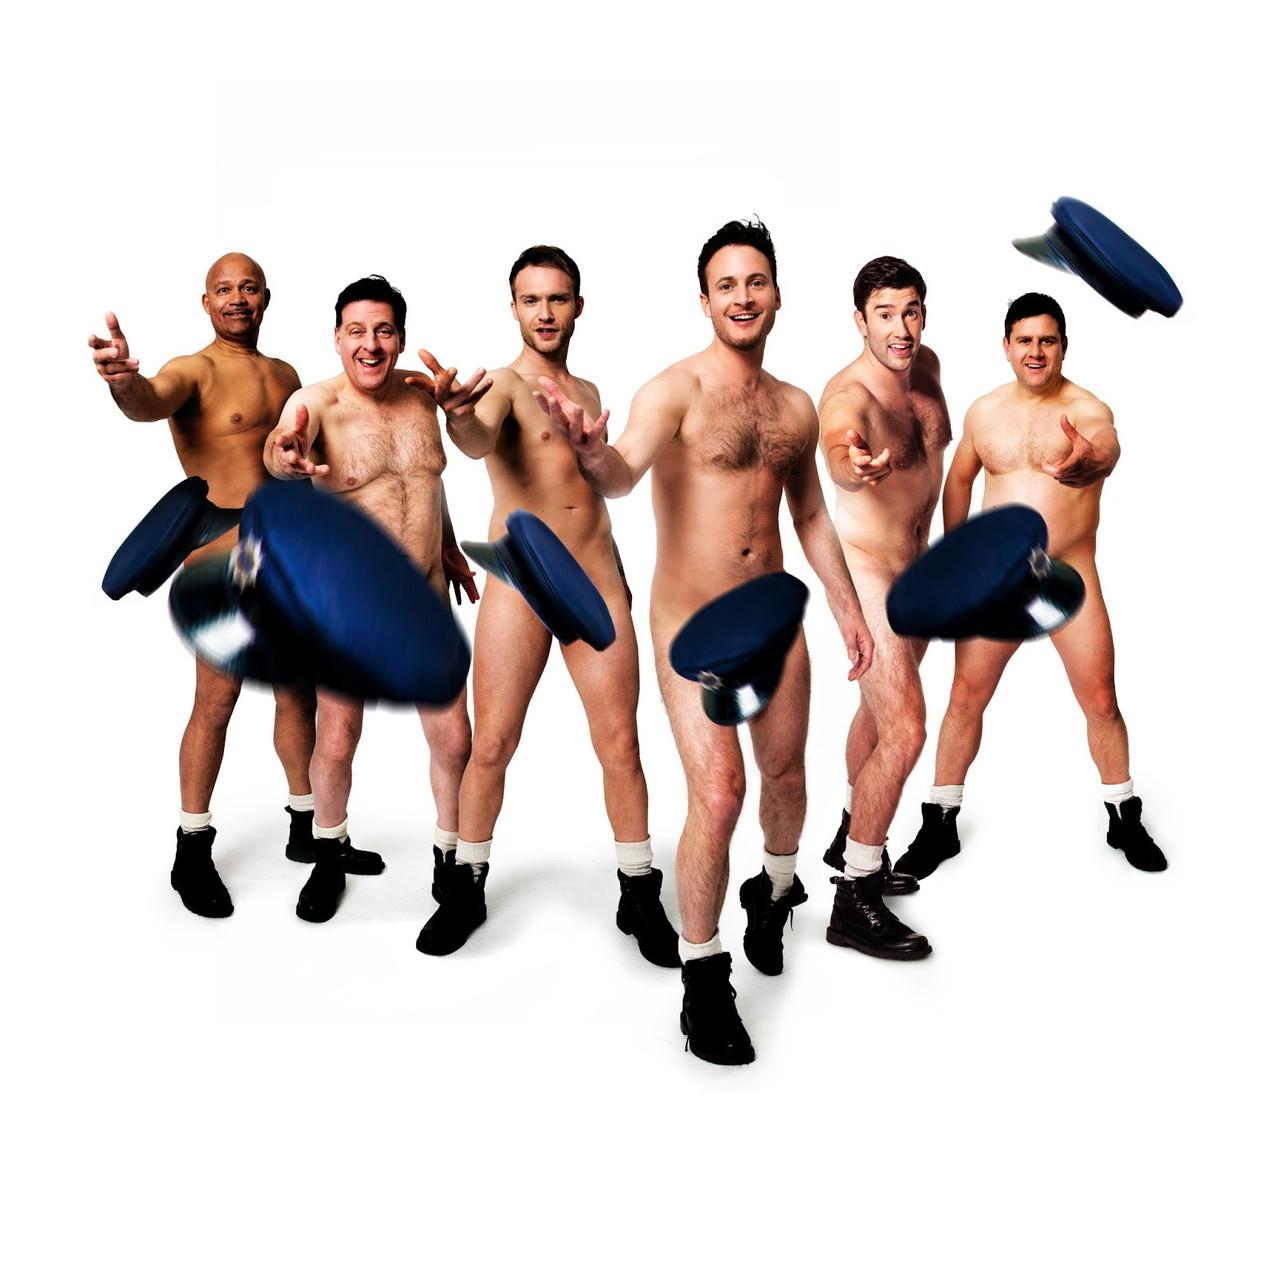 Louis Emerick, Andrew Dunn, Chris Fountain, Gary Lucy, Anthony Lewis, Kai Owen in THE FULL MONTY credit Matt Crockett